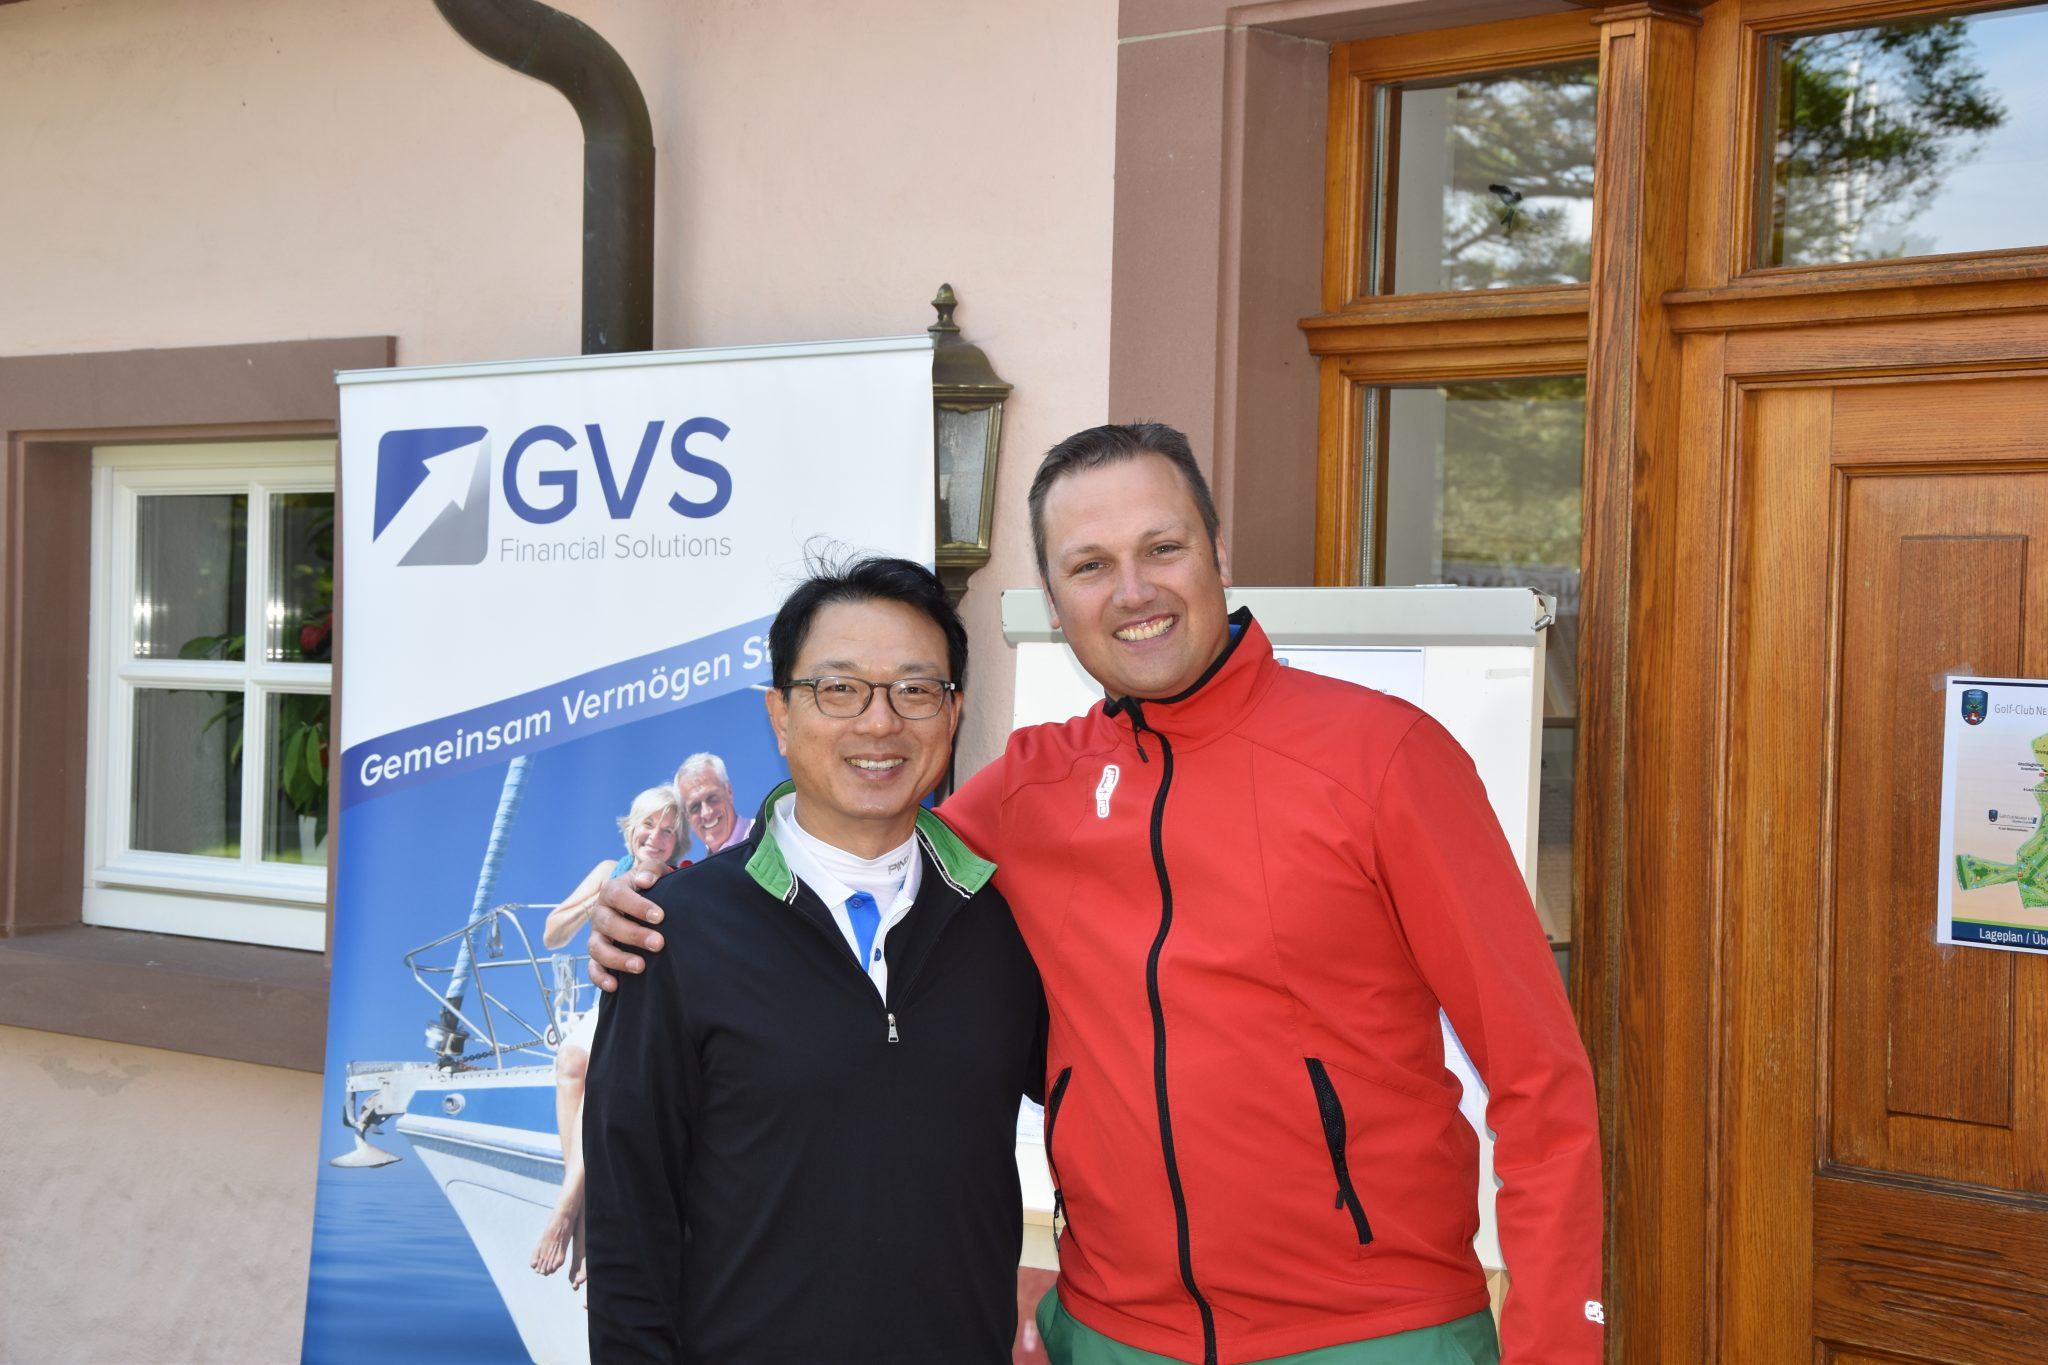 Welcome-at-Neuhof-GVS